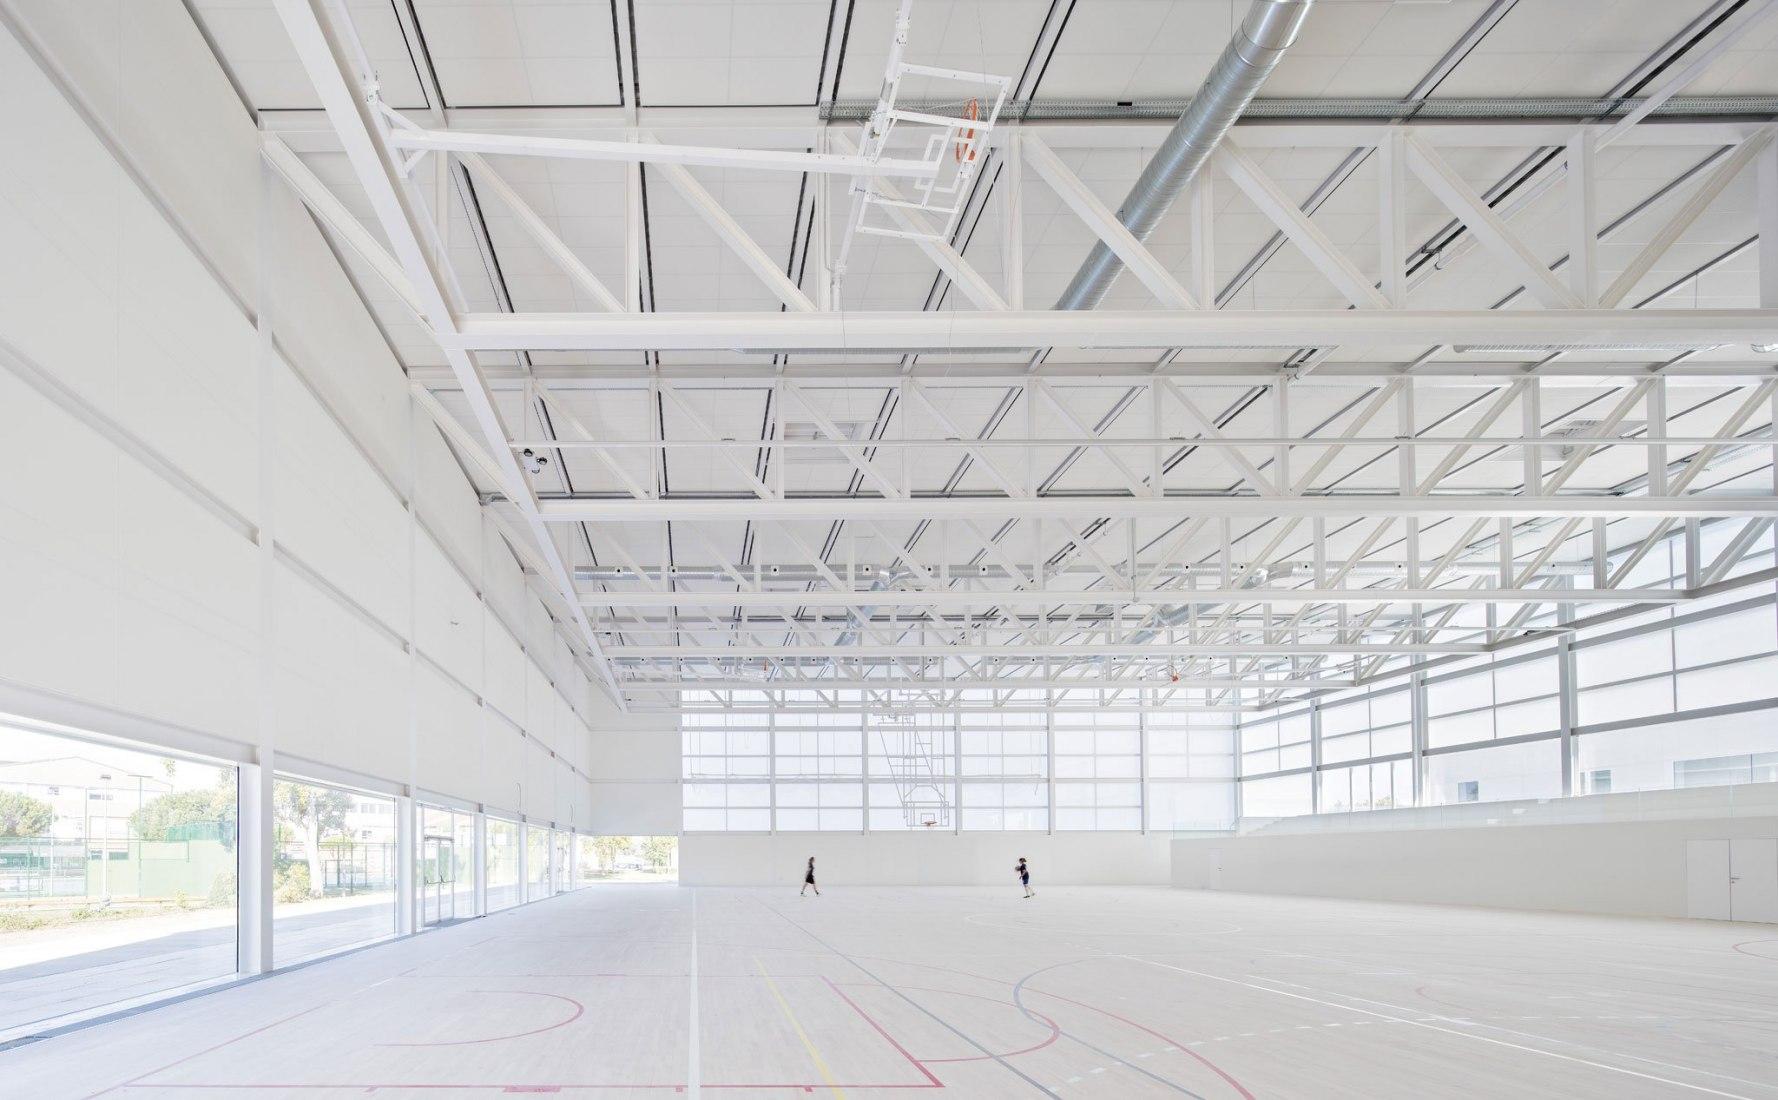 Sports center. Universidad Francisco de Vitoria Sports Center by Alberto Campo Baeza. Photograph © Javier Callejas